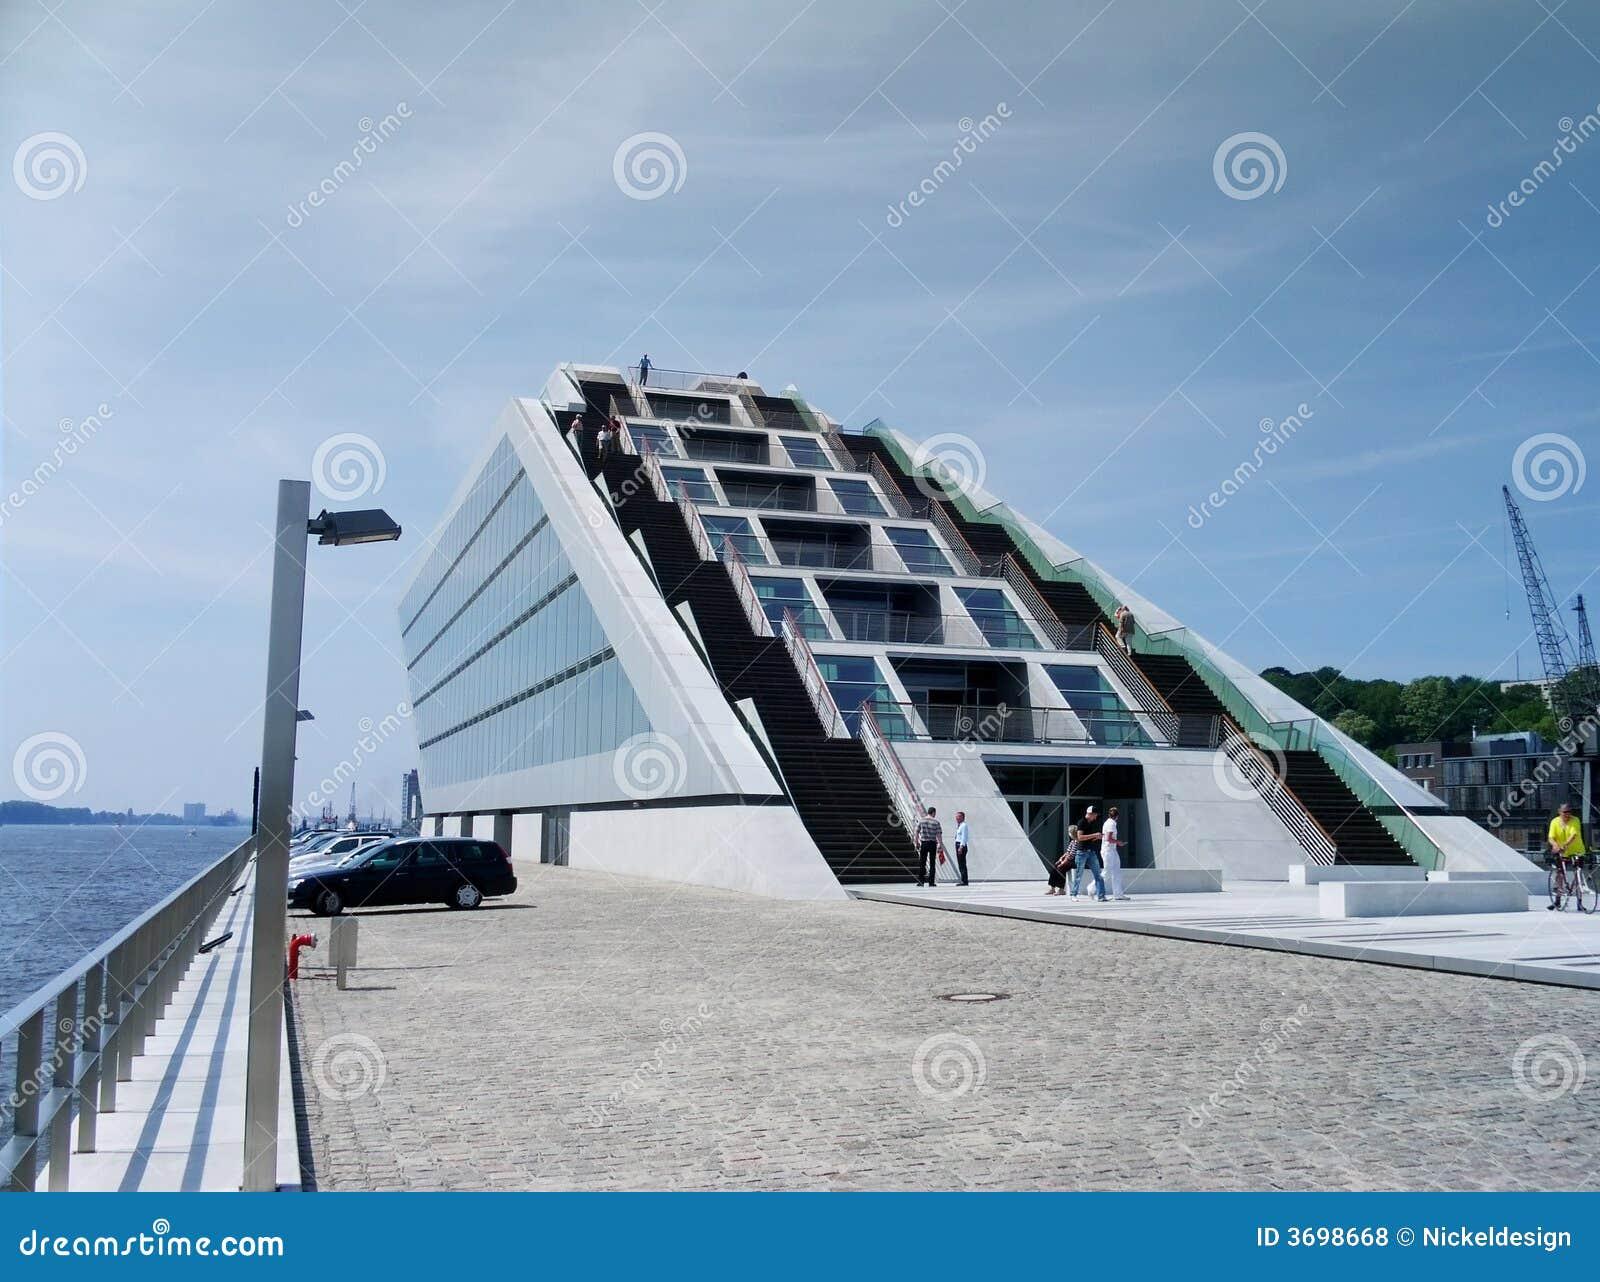 Treppe Hamburg agentur morgens hafen treppe stockfoto bild modern